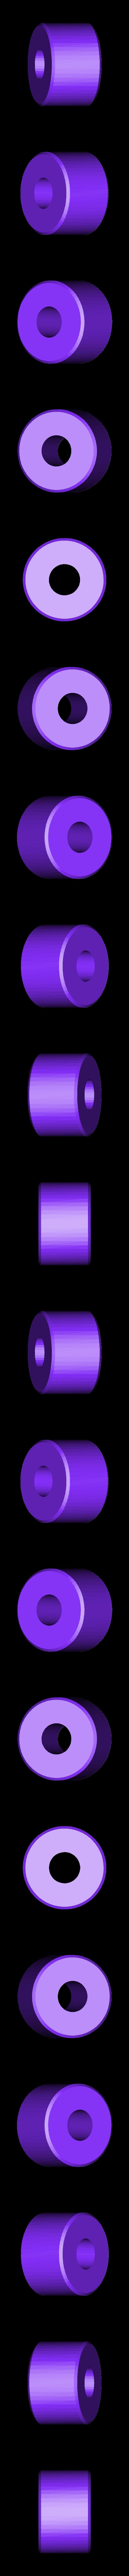 InnerBushing2.STL Download free STL file Bearing Holder for 15mm OD 8mm ID 5mm Wide Bearing to improve a Harbor Freight Rock Tumbler • 3D printer design, TikiLuke